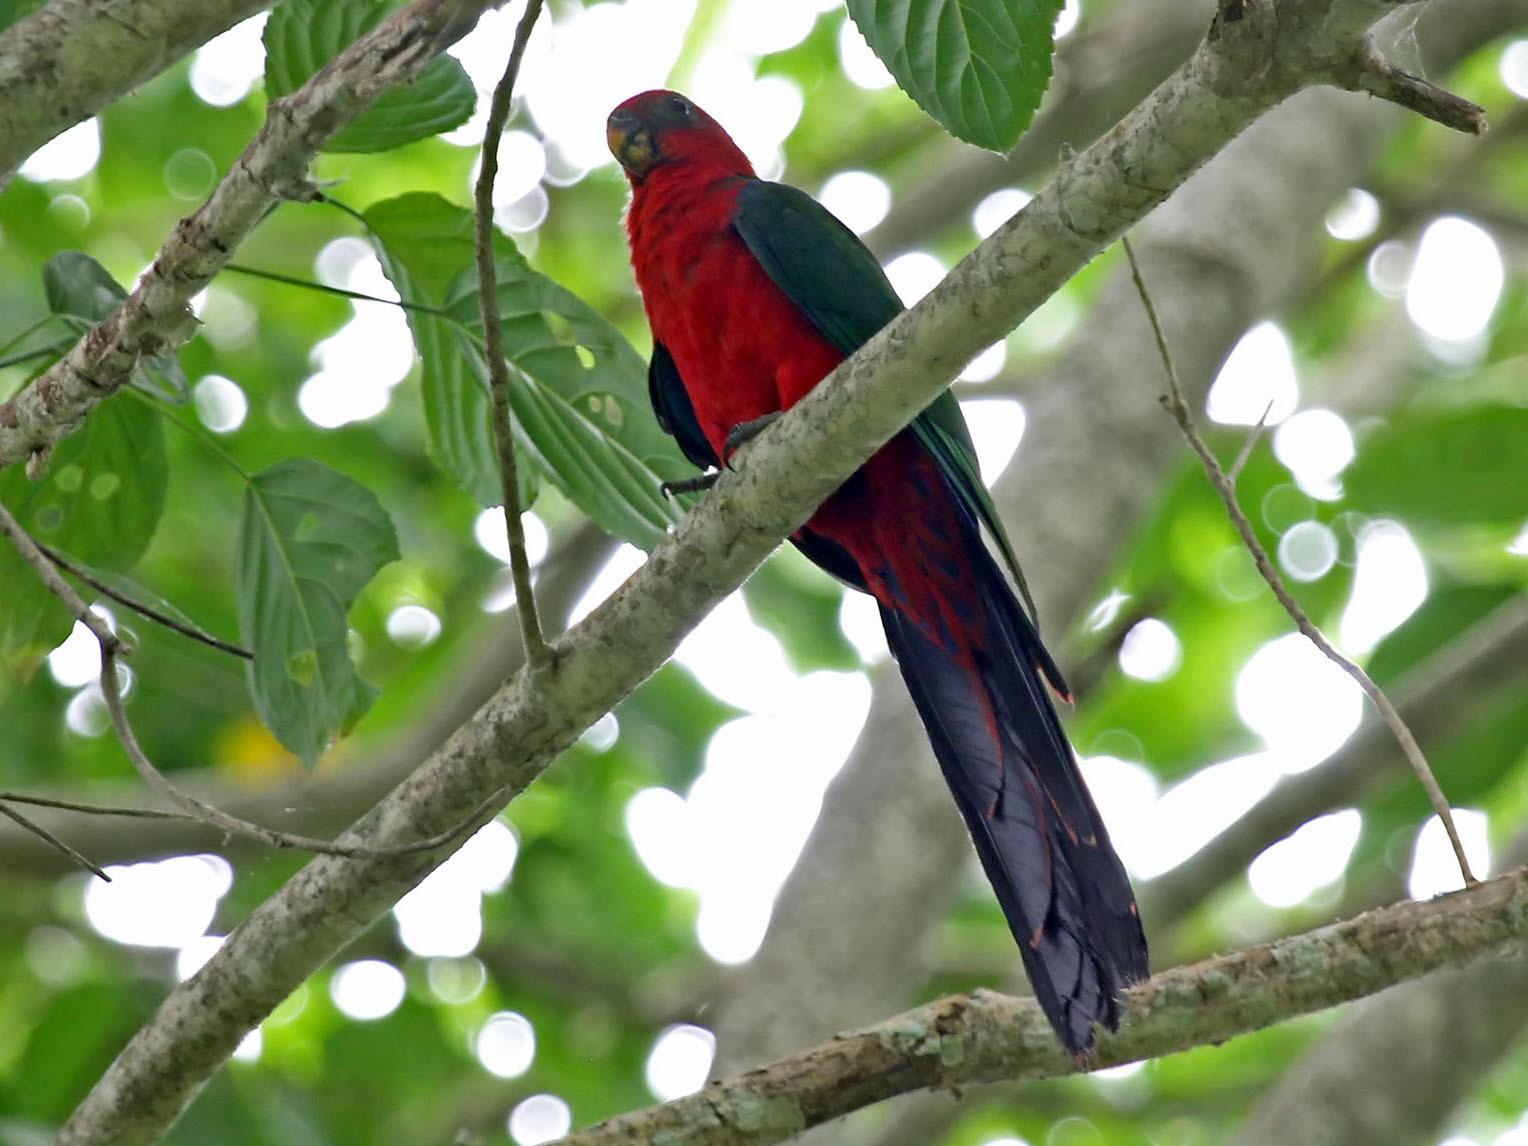 Moluccan King-Parrot - Phillip Edwards